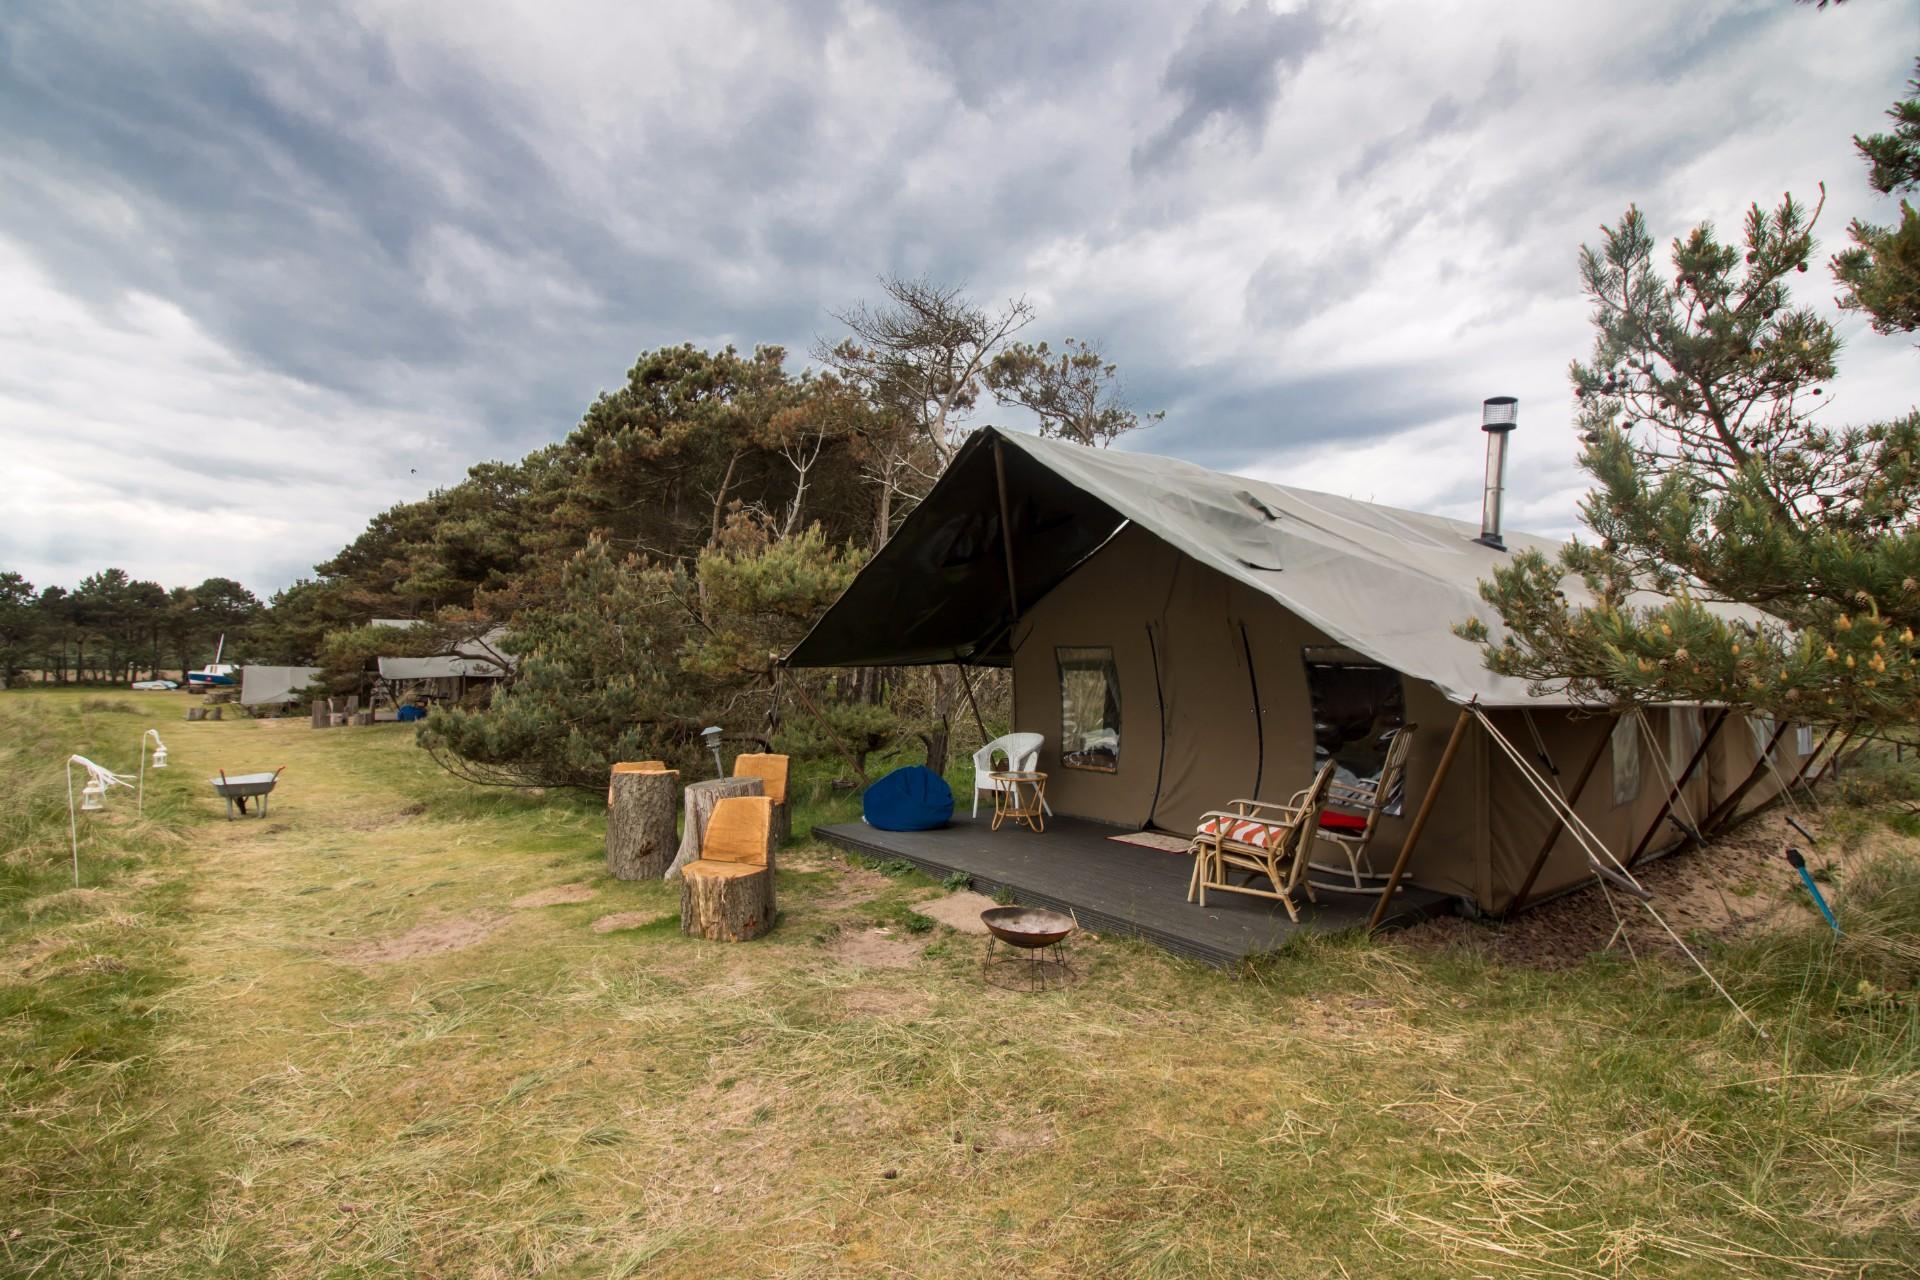 Sleeping in a Safari Tent at Harvest Moon Holidays near North Berwick East Lothian ... & Sleeping in a Safari Tent at Harvest Moon Holidays | Faraway Lucy